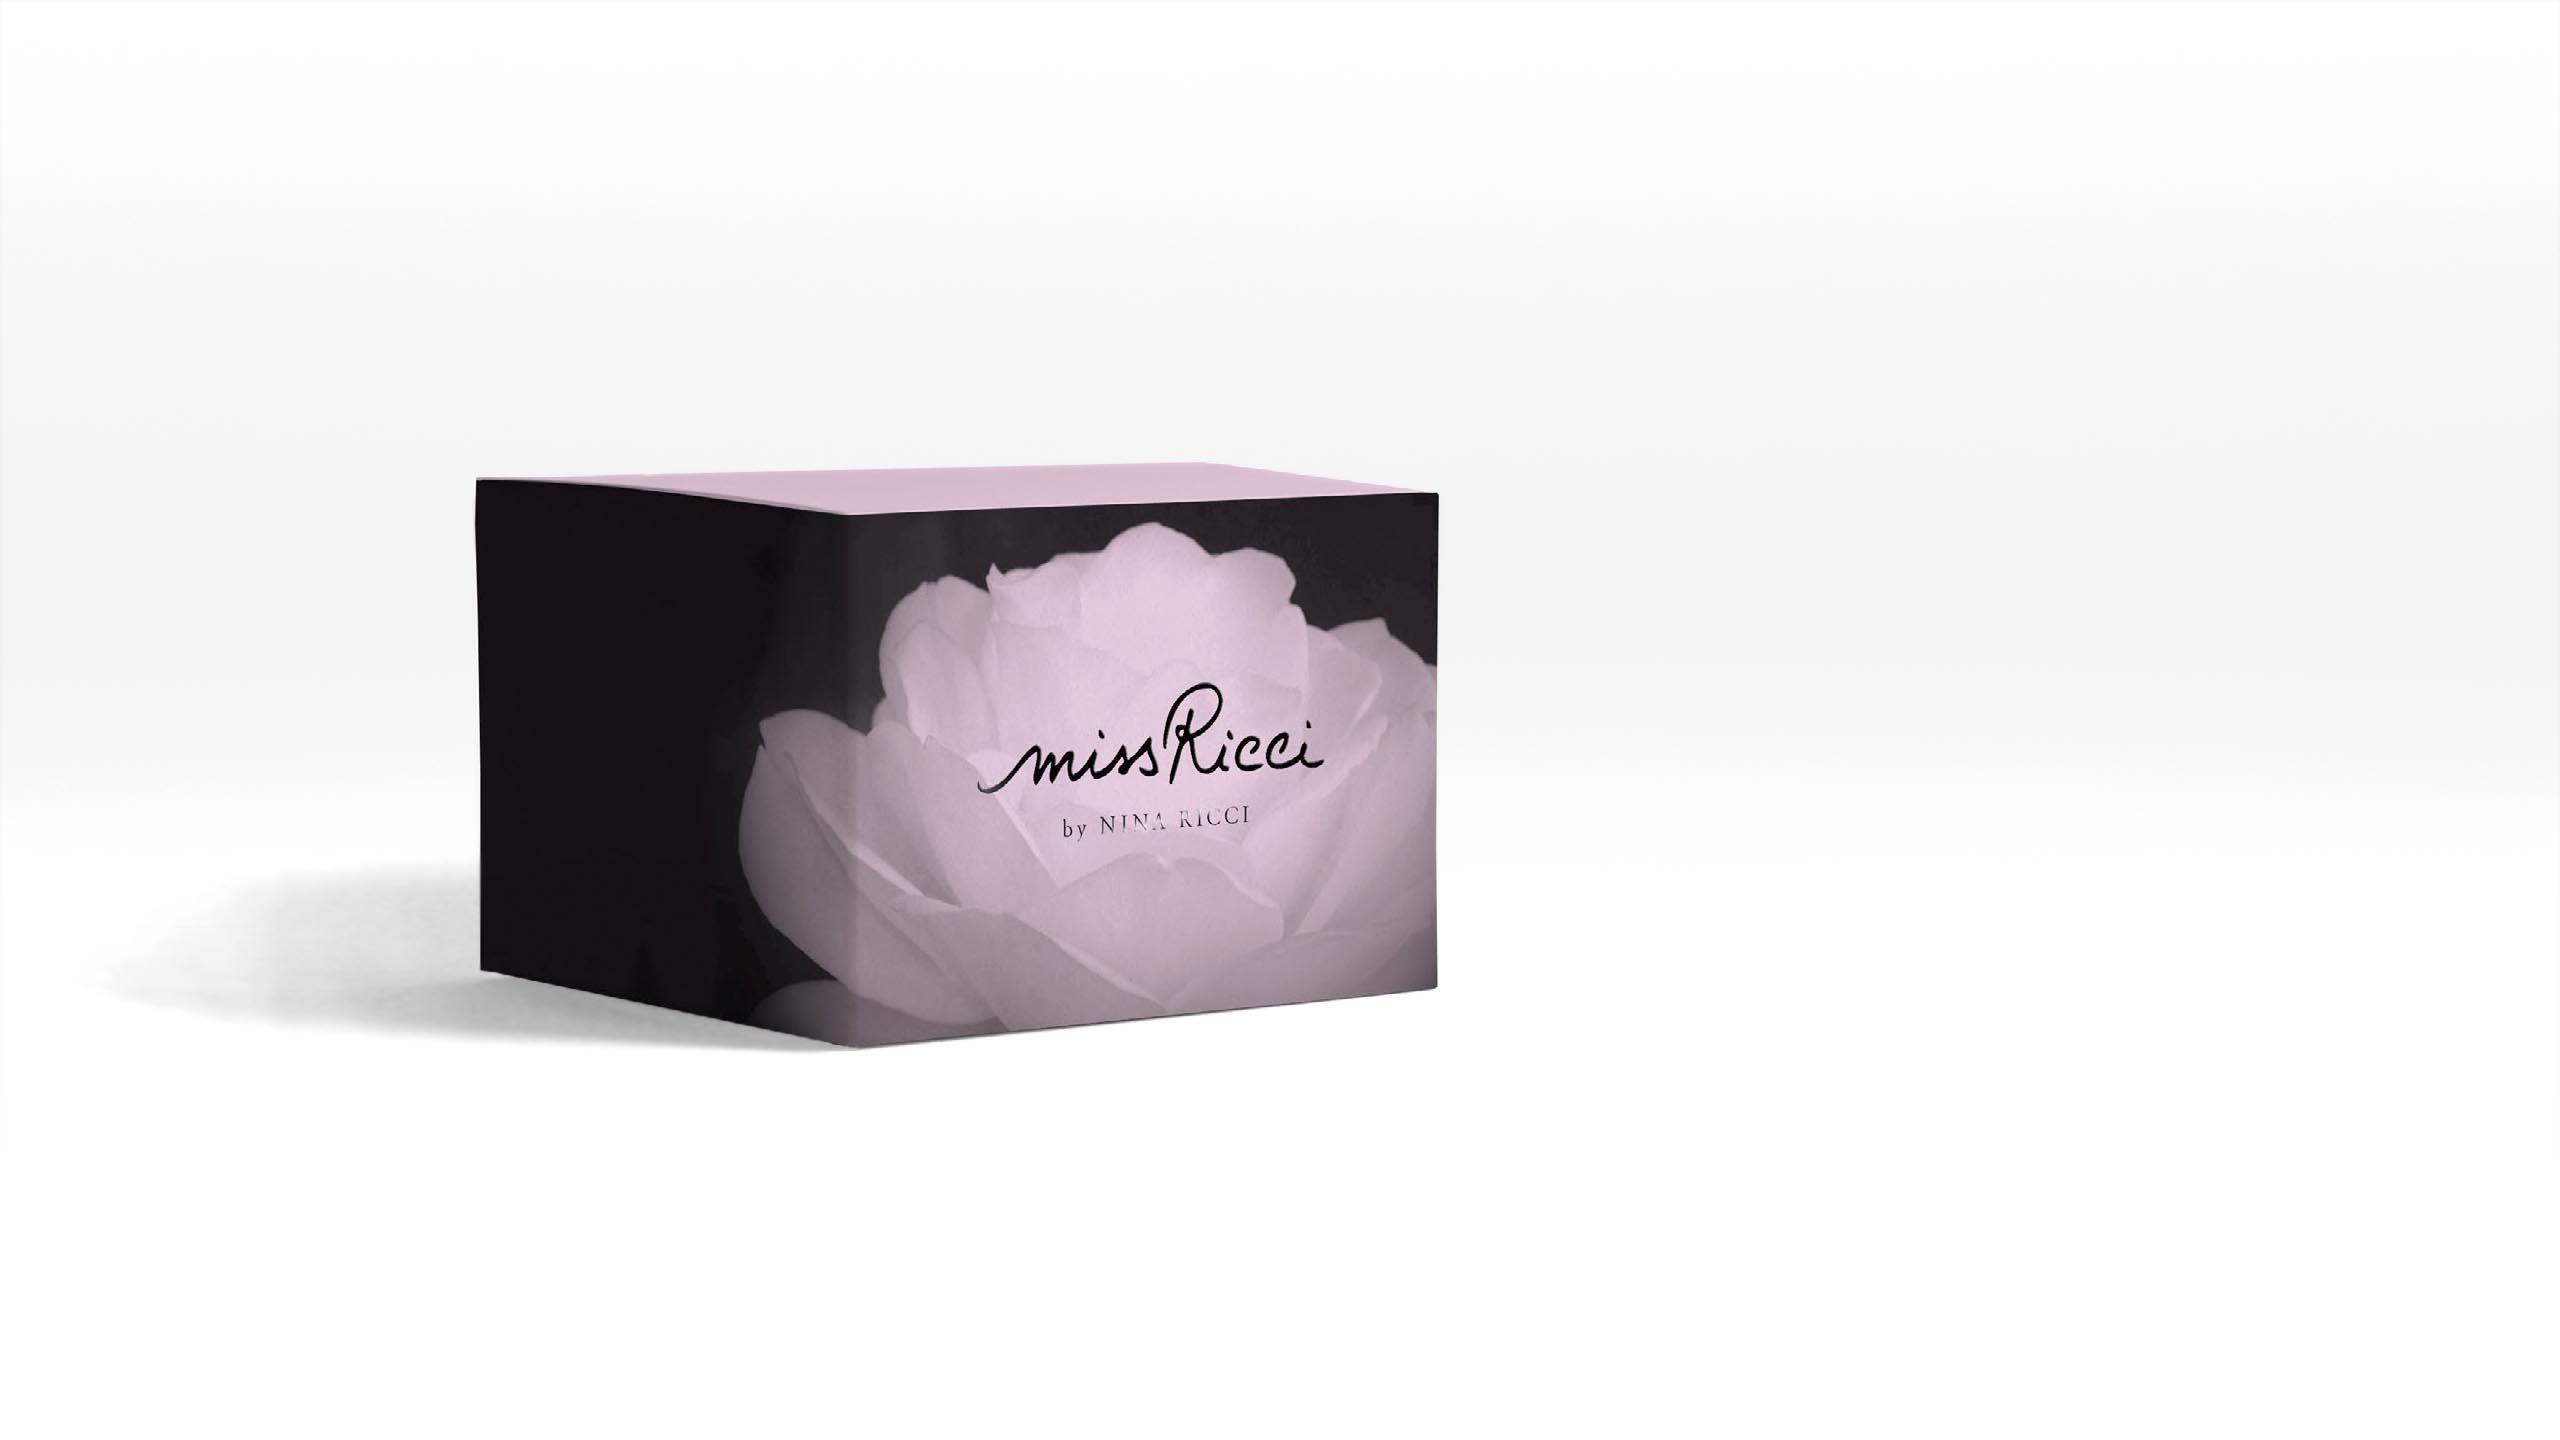 brand product design study for Nina Ricci perfume